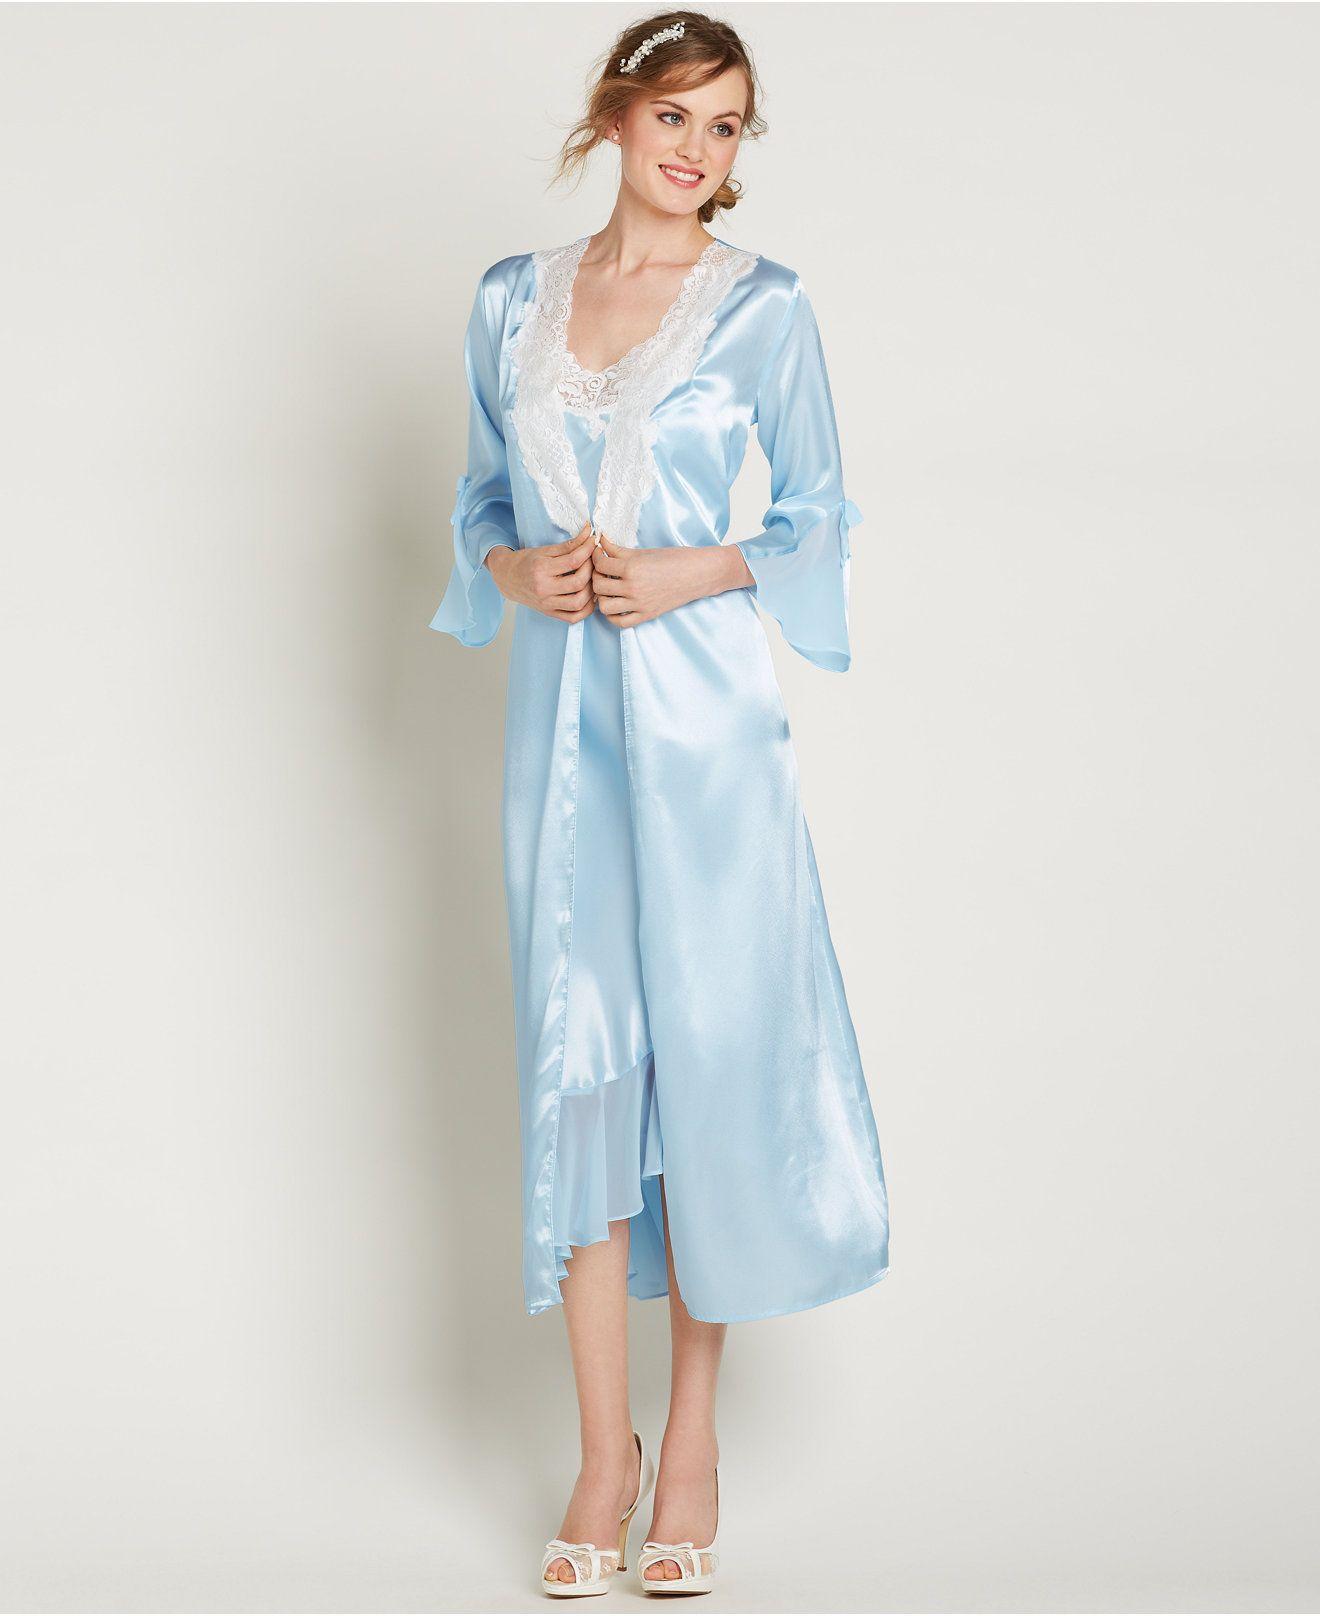 8ffa6952e8  74.00 Oscar de La Renta Pink Label Satin Always a Bride Long Gown and Robe  - Shop All Pajamas   Robes - Women - Macy s